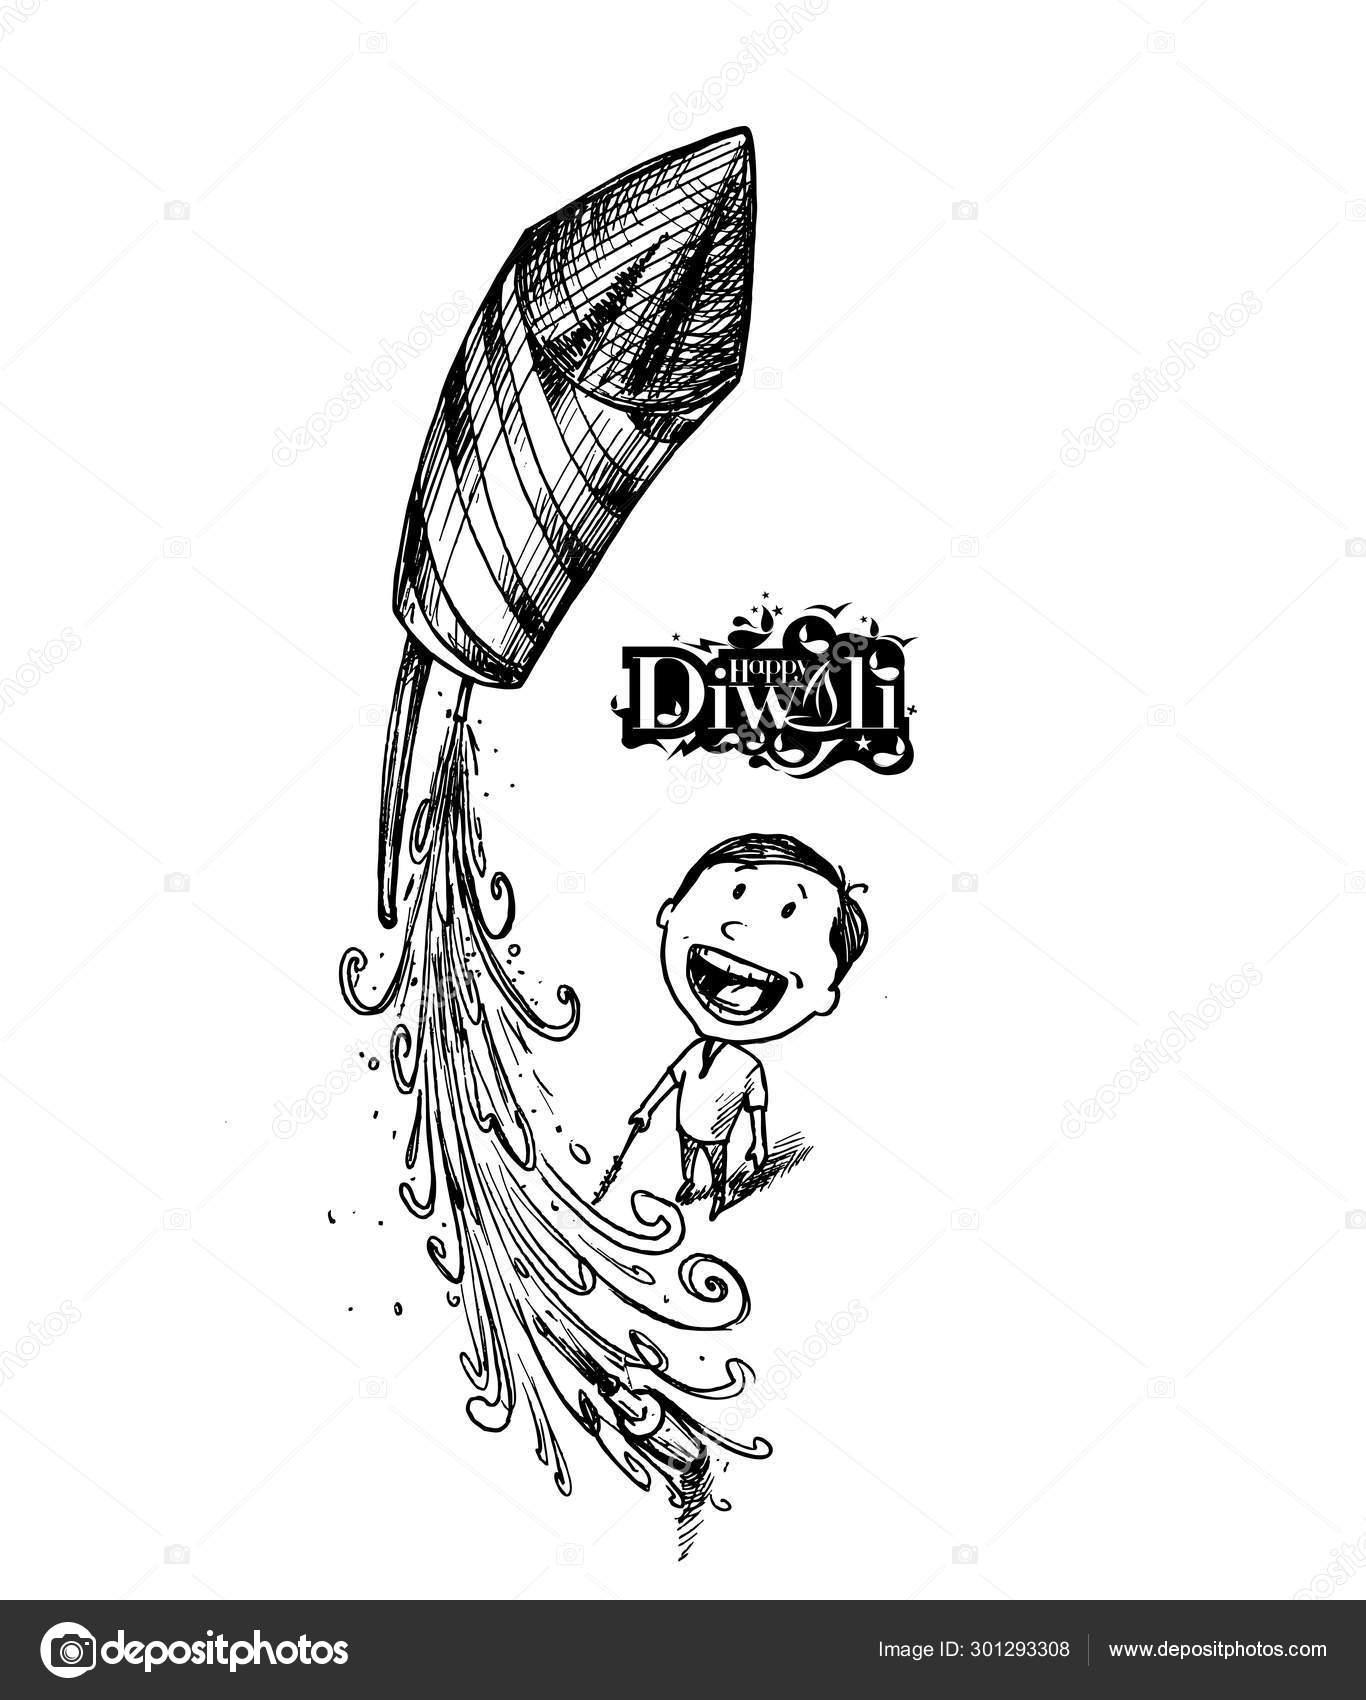 Boy flying rocket indian festival diwali celebration